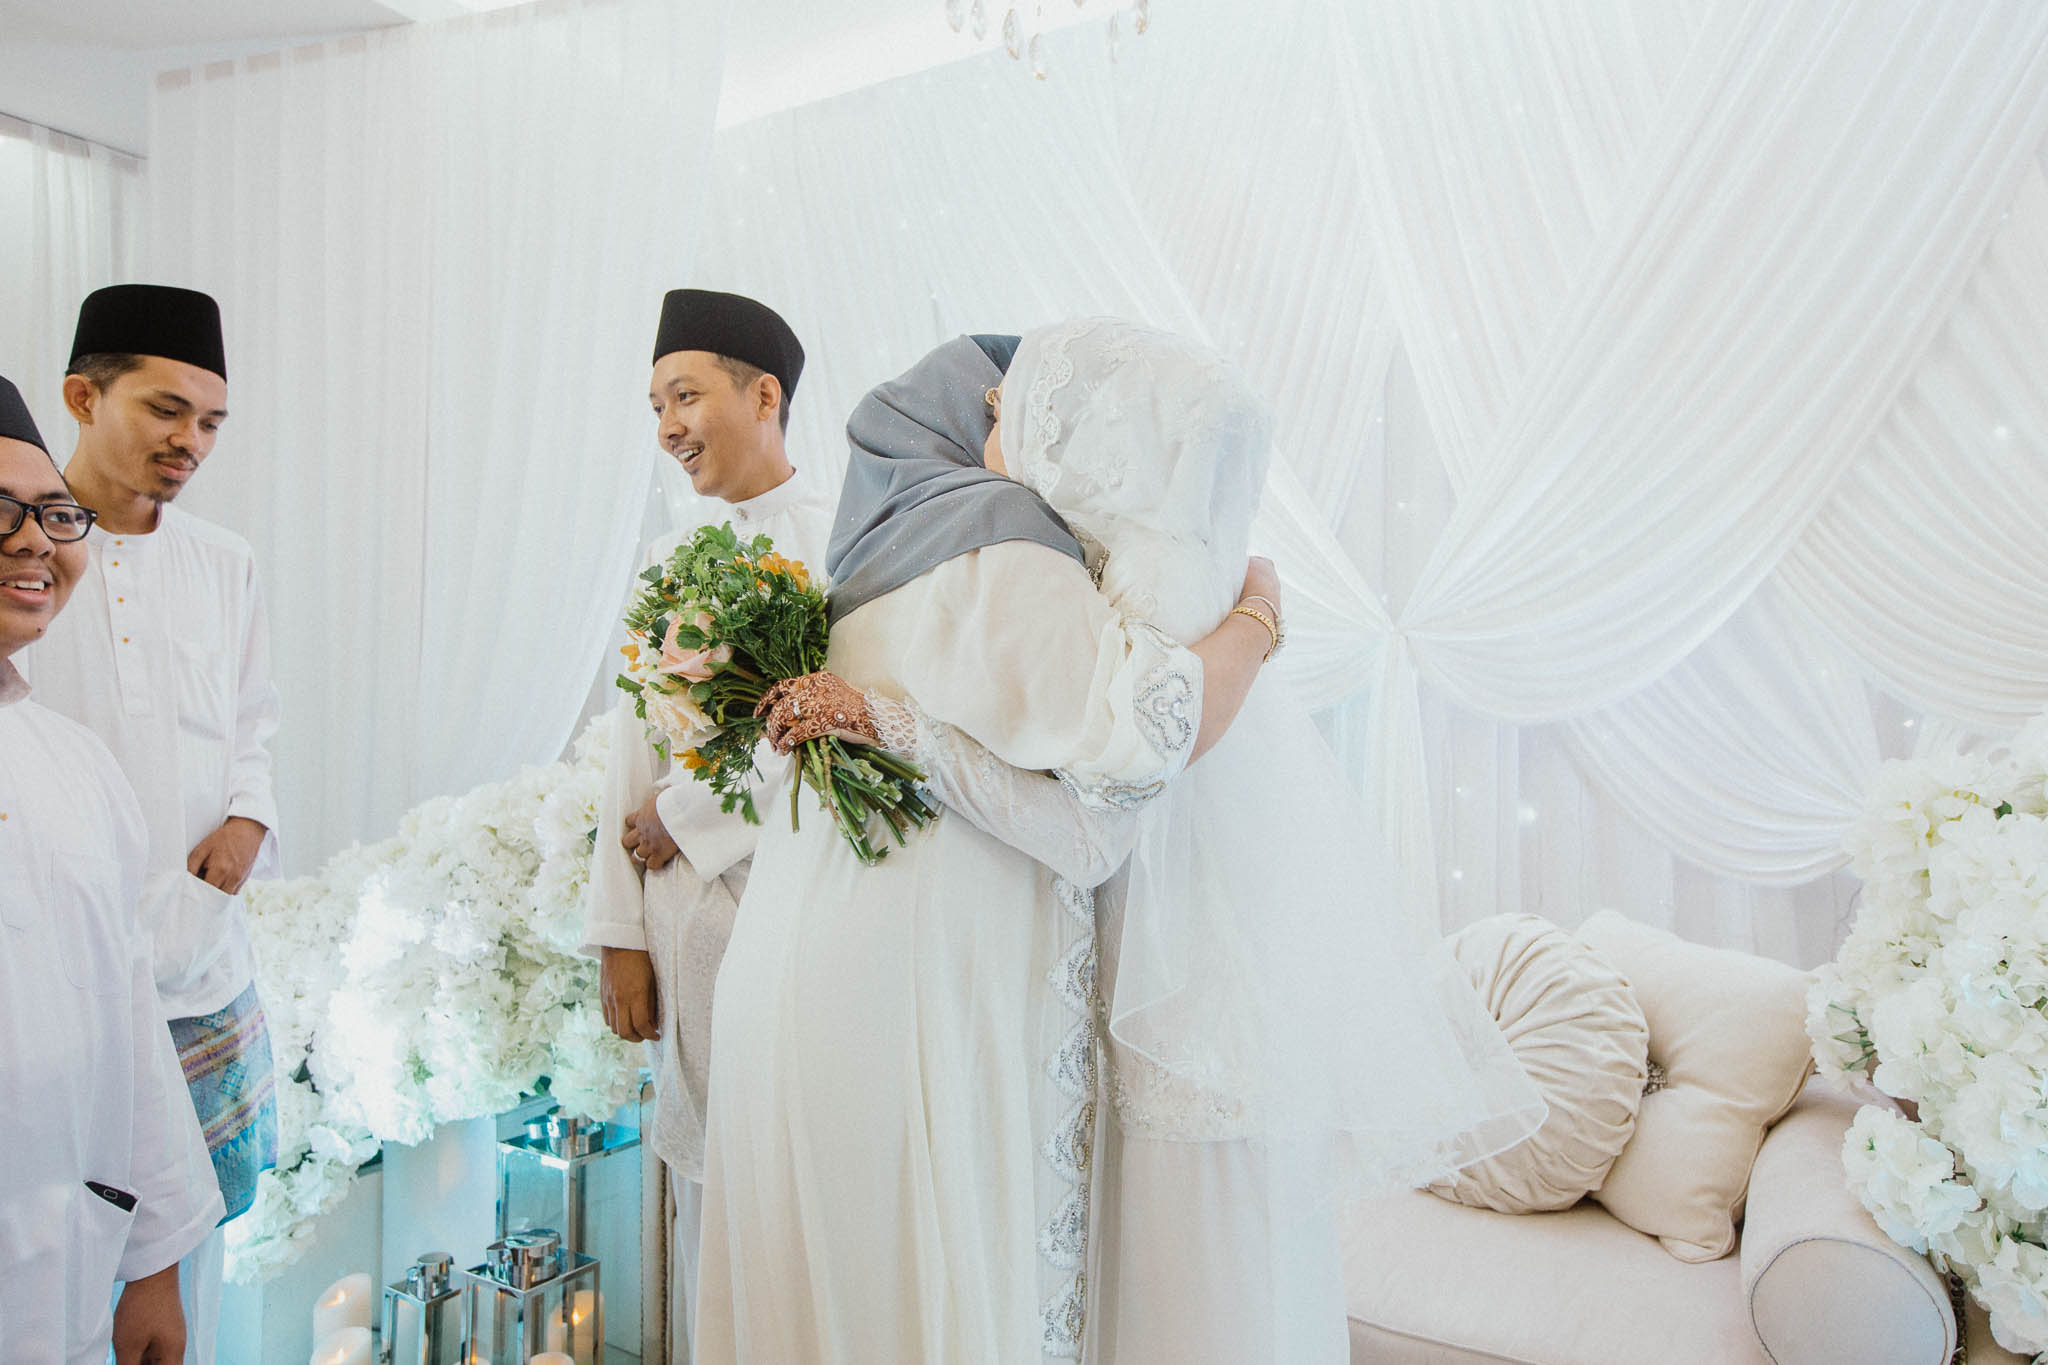 singapore-wedding-photographer-addafiq-nufail-028.jpg